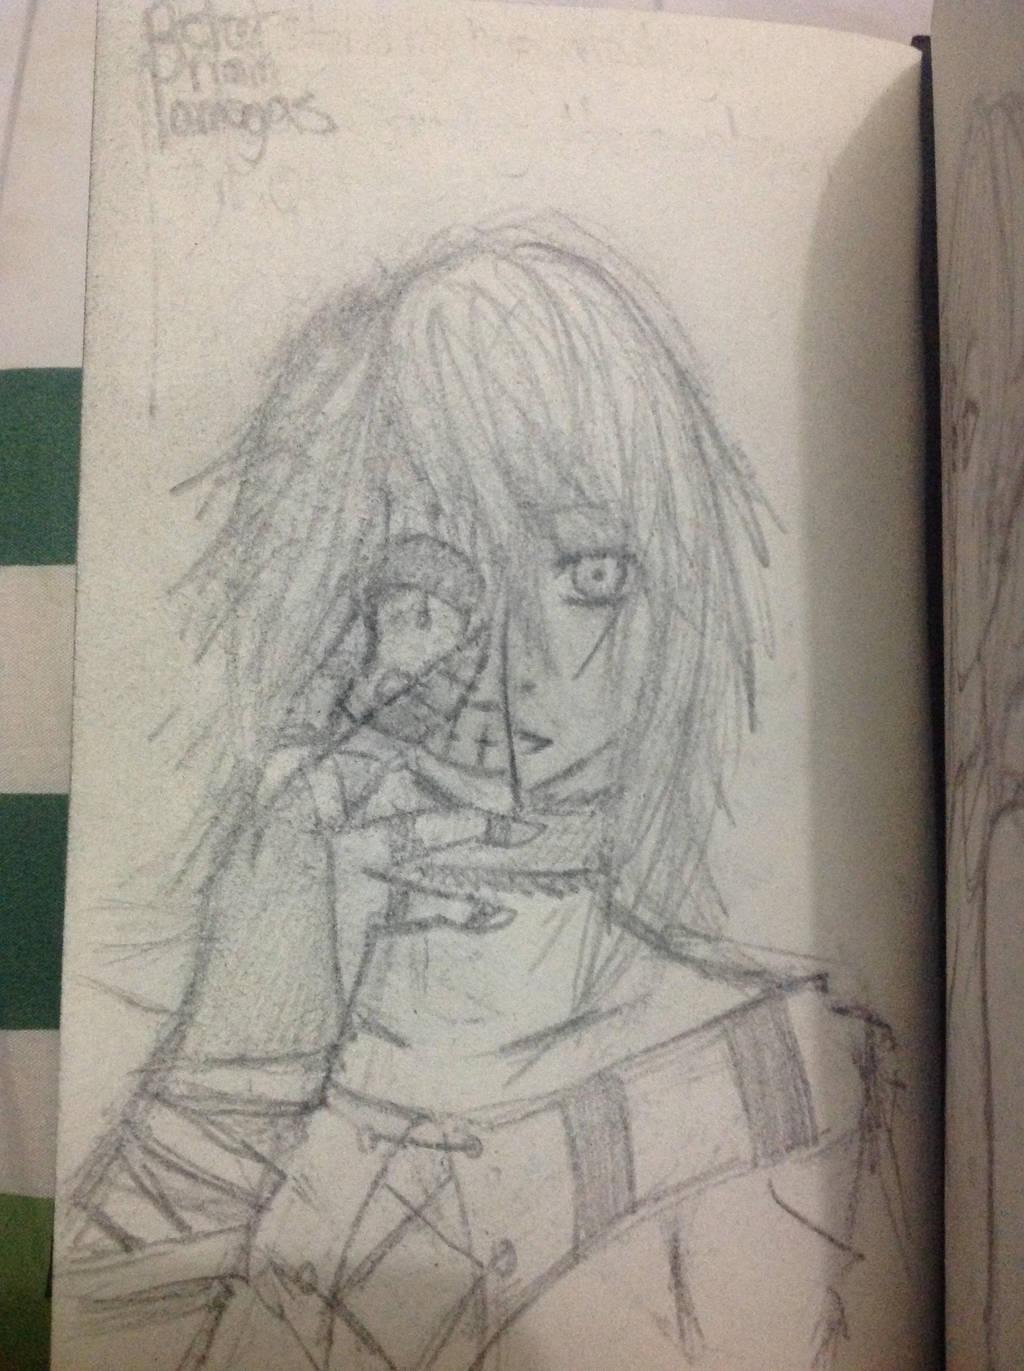 Karakuri Pierrot by Demon-Shinob1